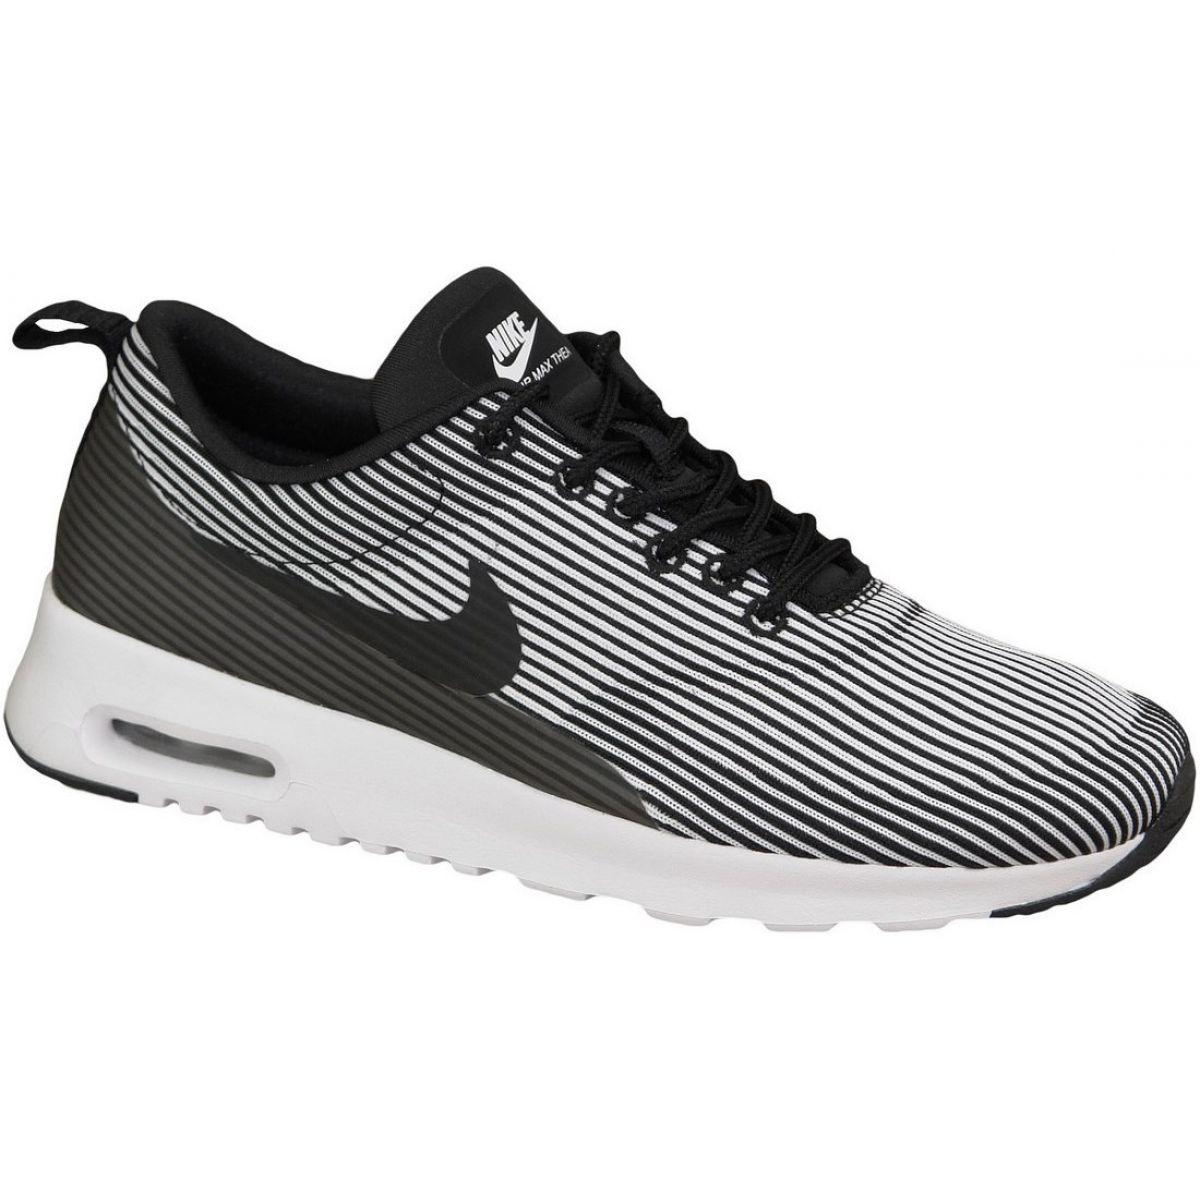 Buty treningowe damskie Wmns Nike Air Max Thea Premium różowe 845062 600